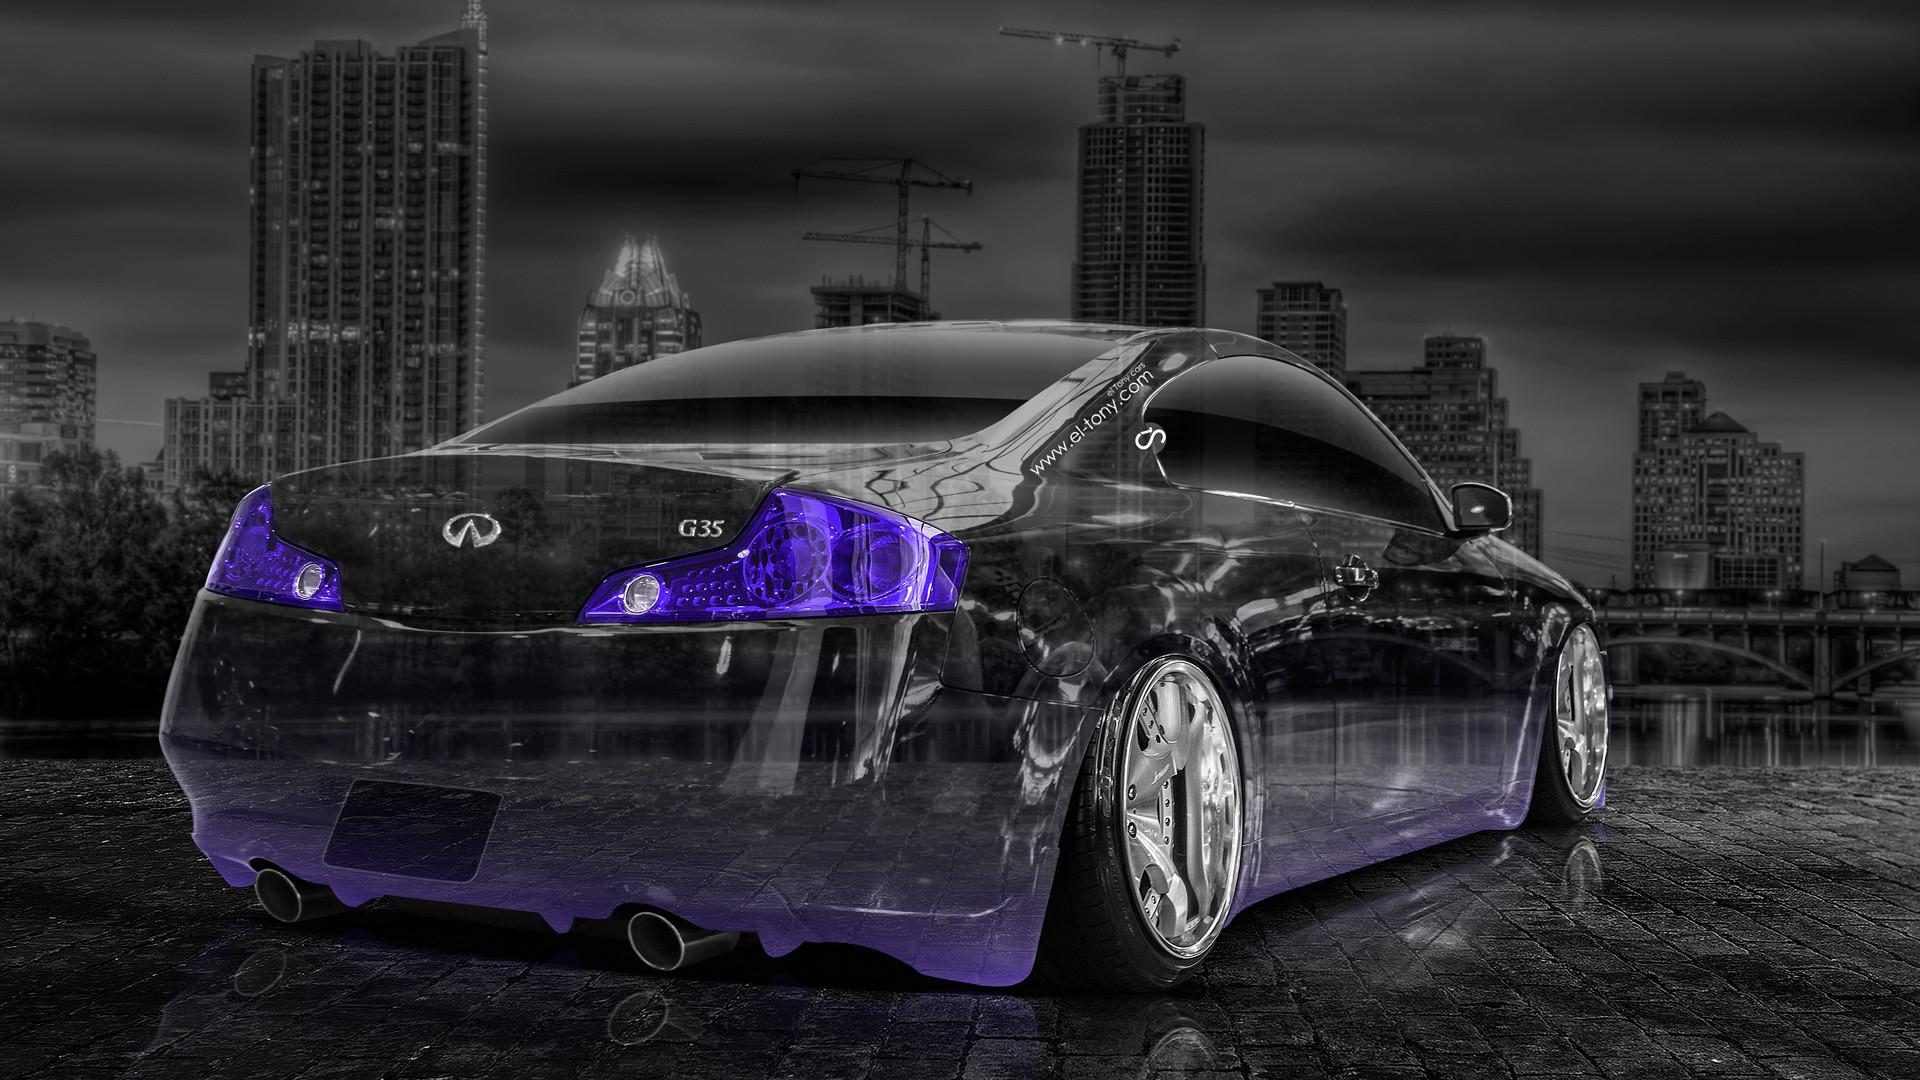 Infiniti-G35-Crystal-City-Car-2014-Violet-Neon-